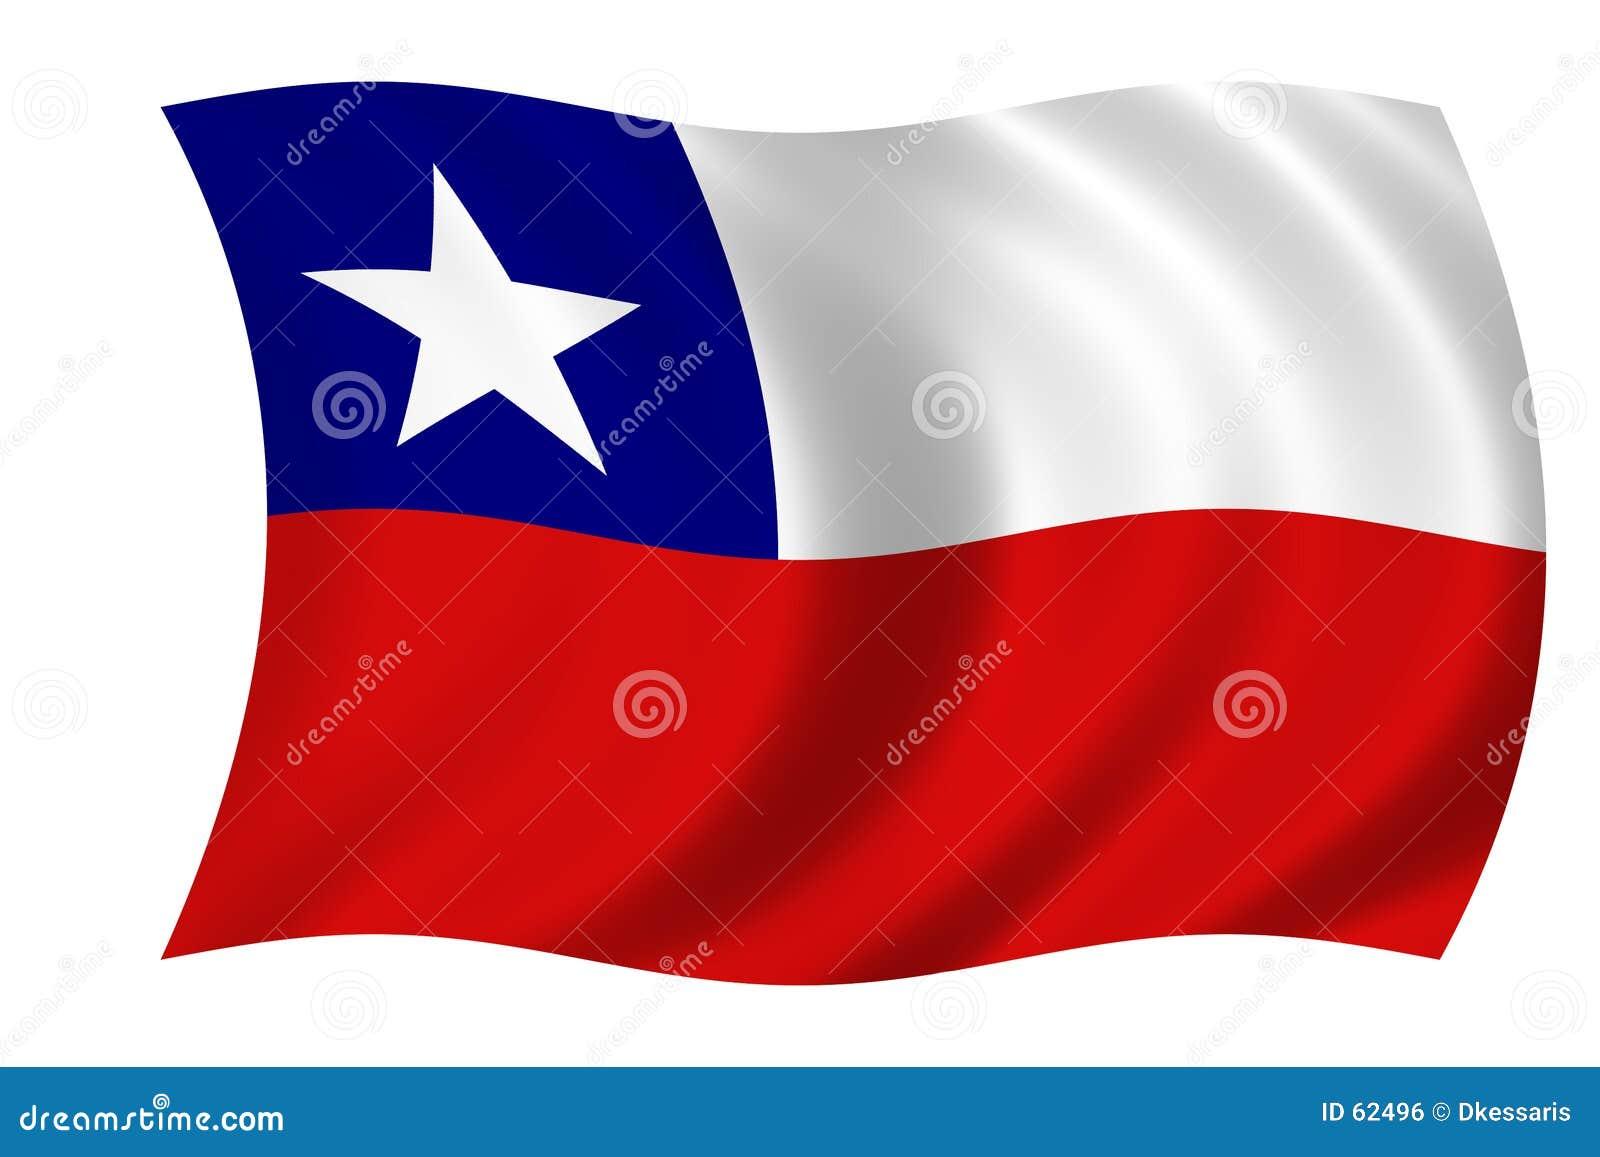 Chile flagę